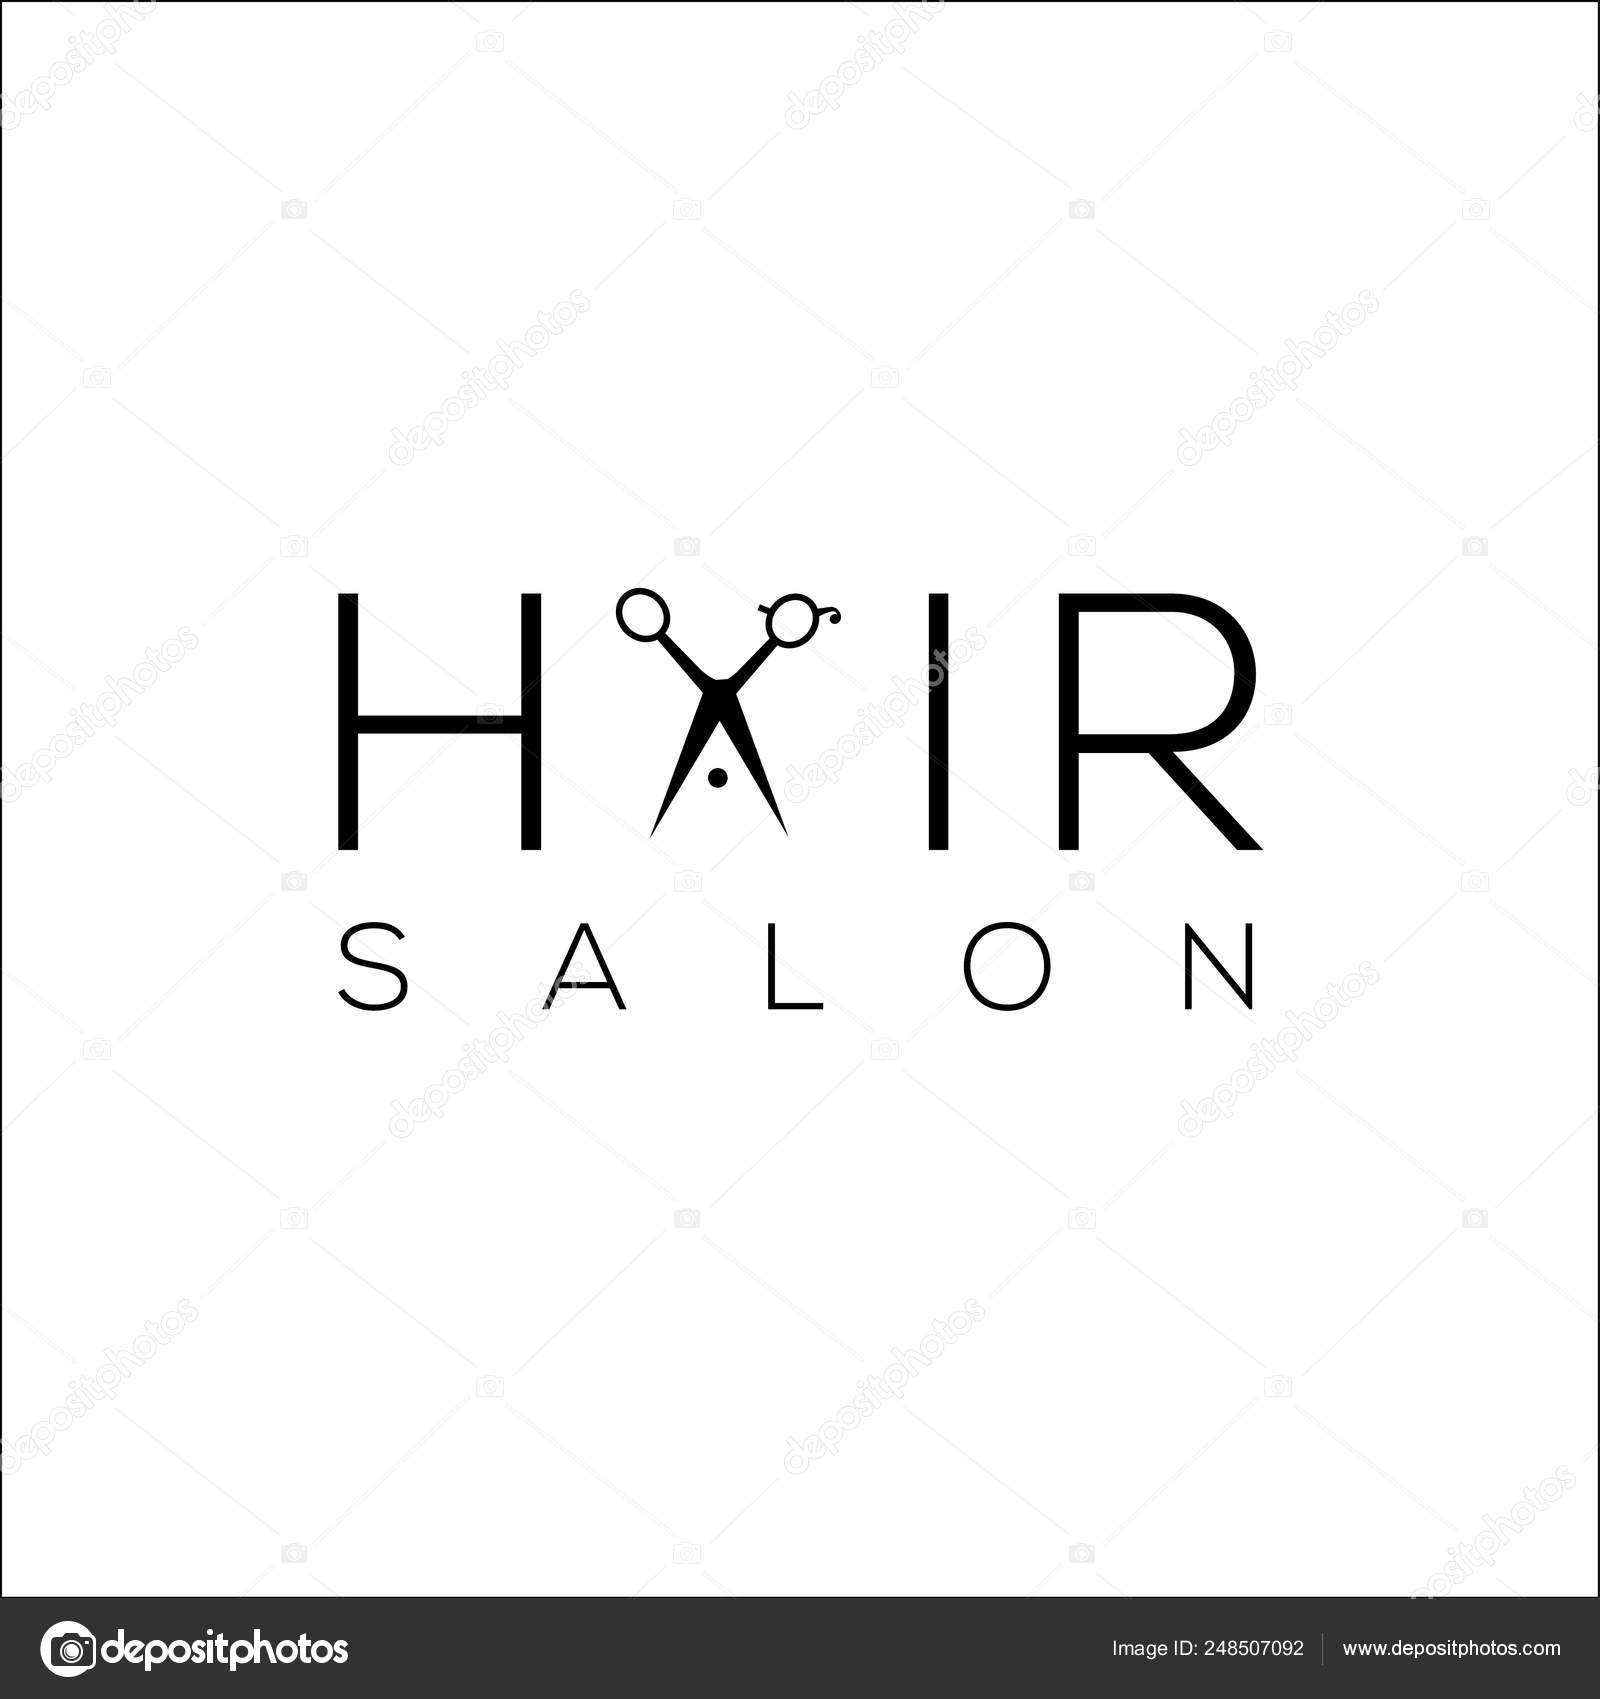 Hair Salon Logo Scissors Hair Salon Logo Scissors Scissors Vector Logo Design Template Vector Stock Vector C Lgn 248507092